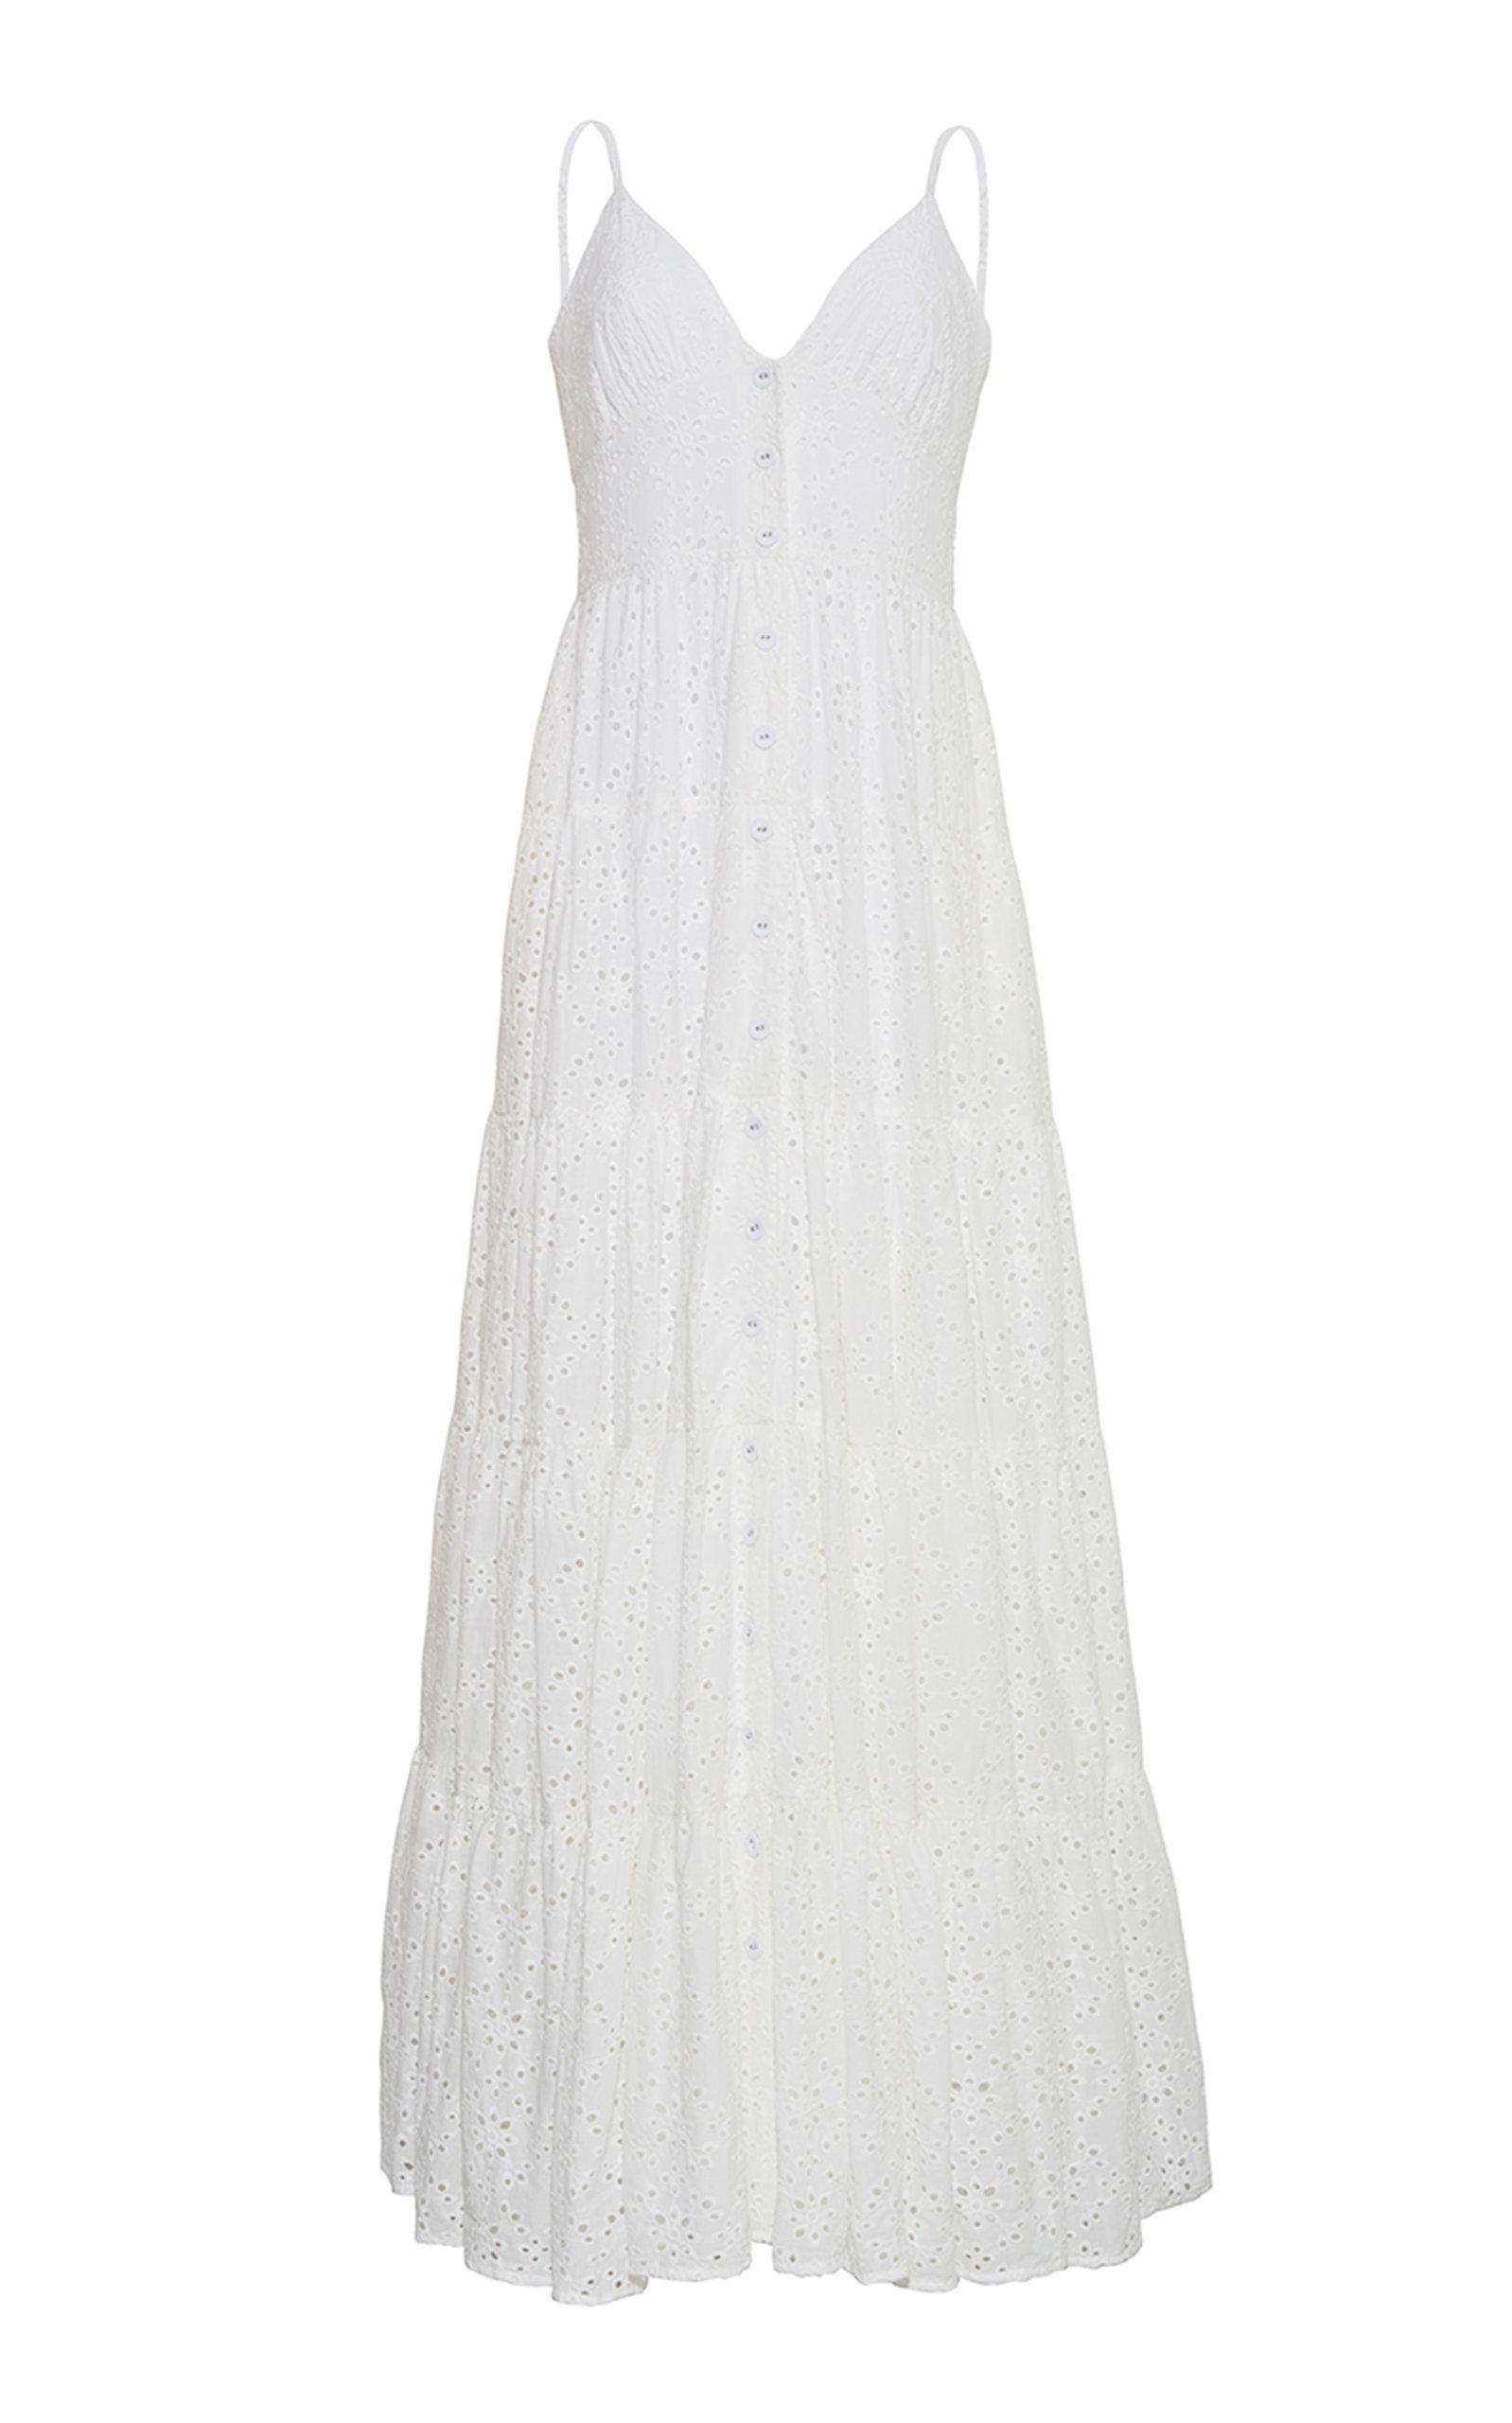 Women's Nathali Cotton Broderie Anglais Maxi Dress